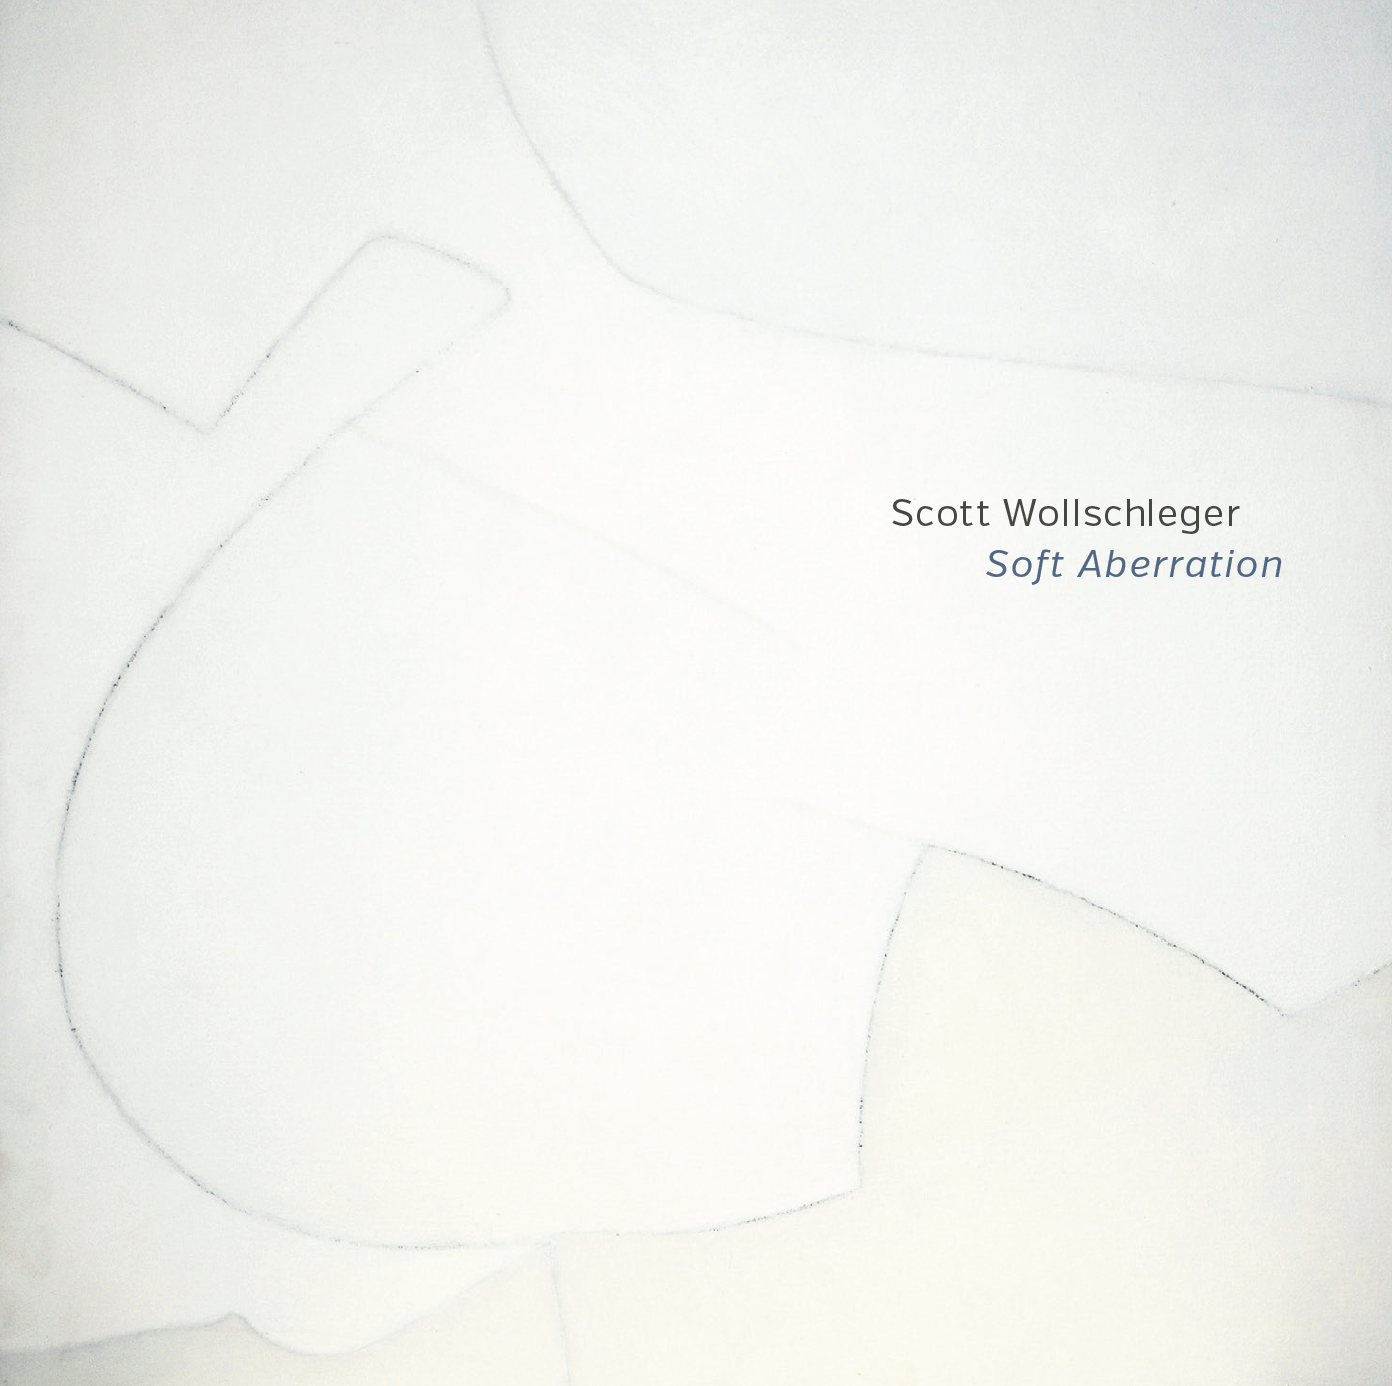 Scott Wollshleger Soft Aberration